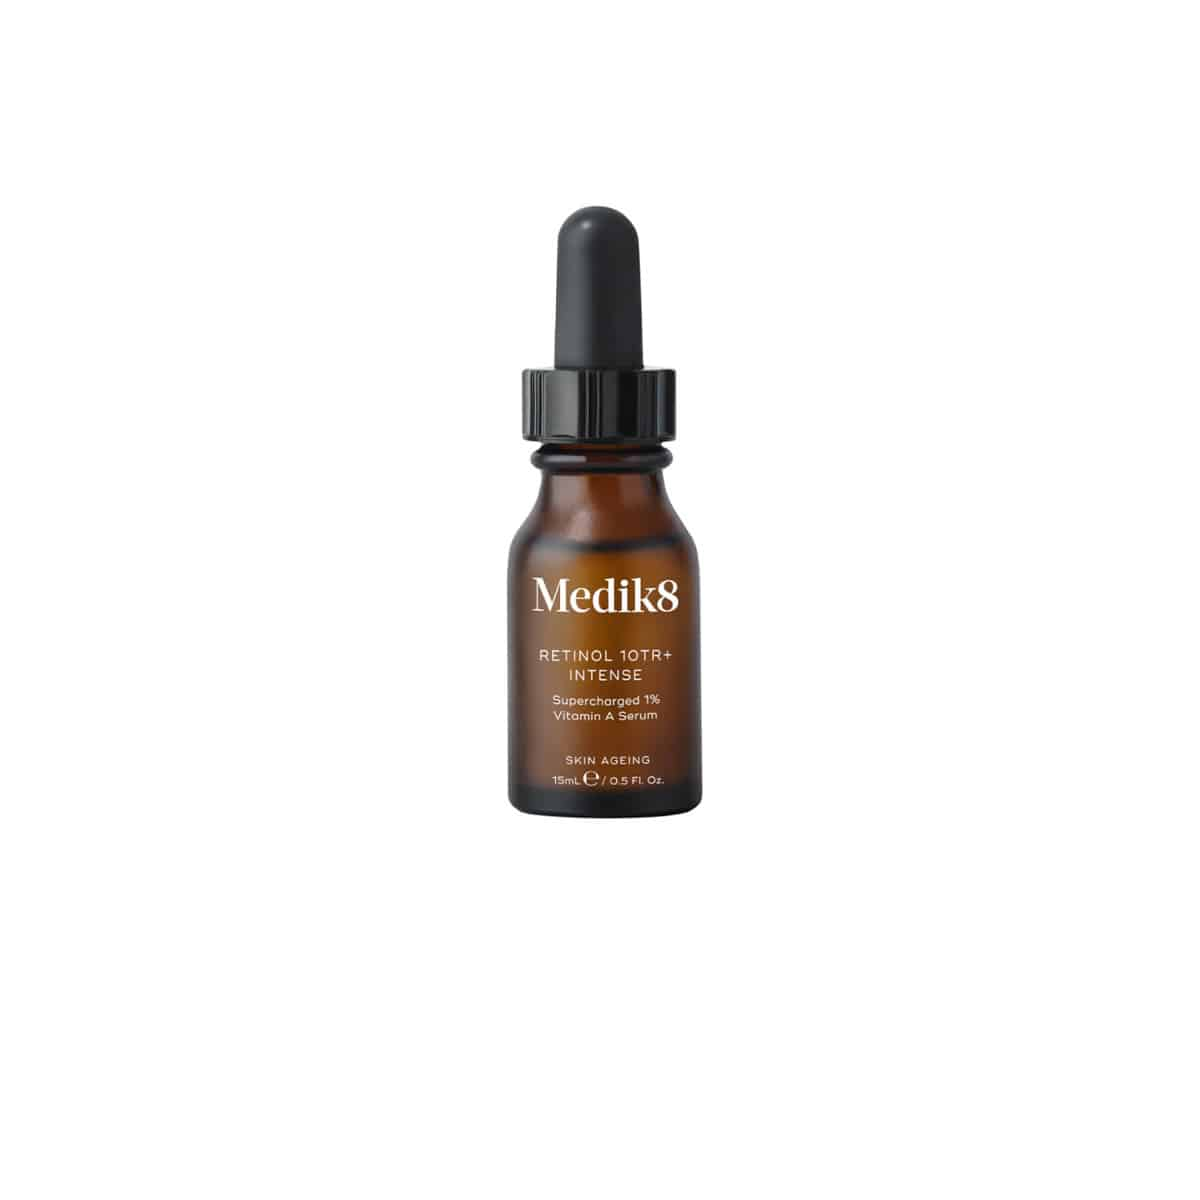 Medik8 Retinol 10TR + Intense